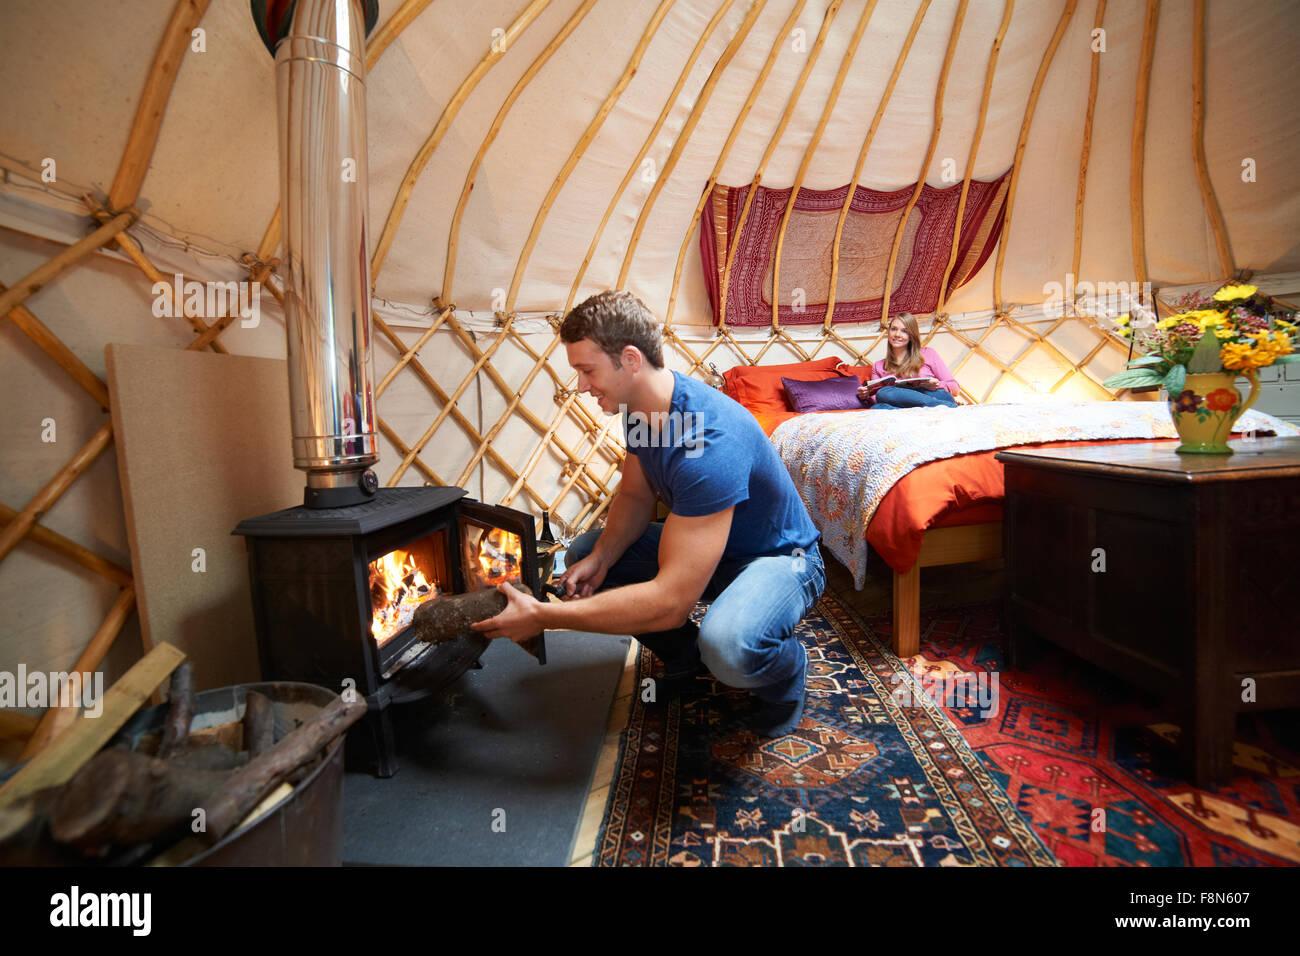 Couple Enjoying Luxury Camping Holiday In Yurt - Stock Image